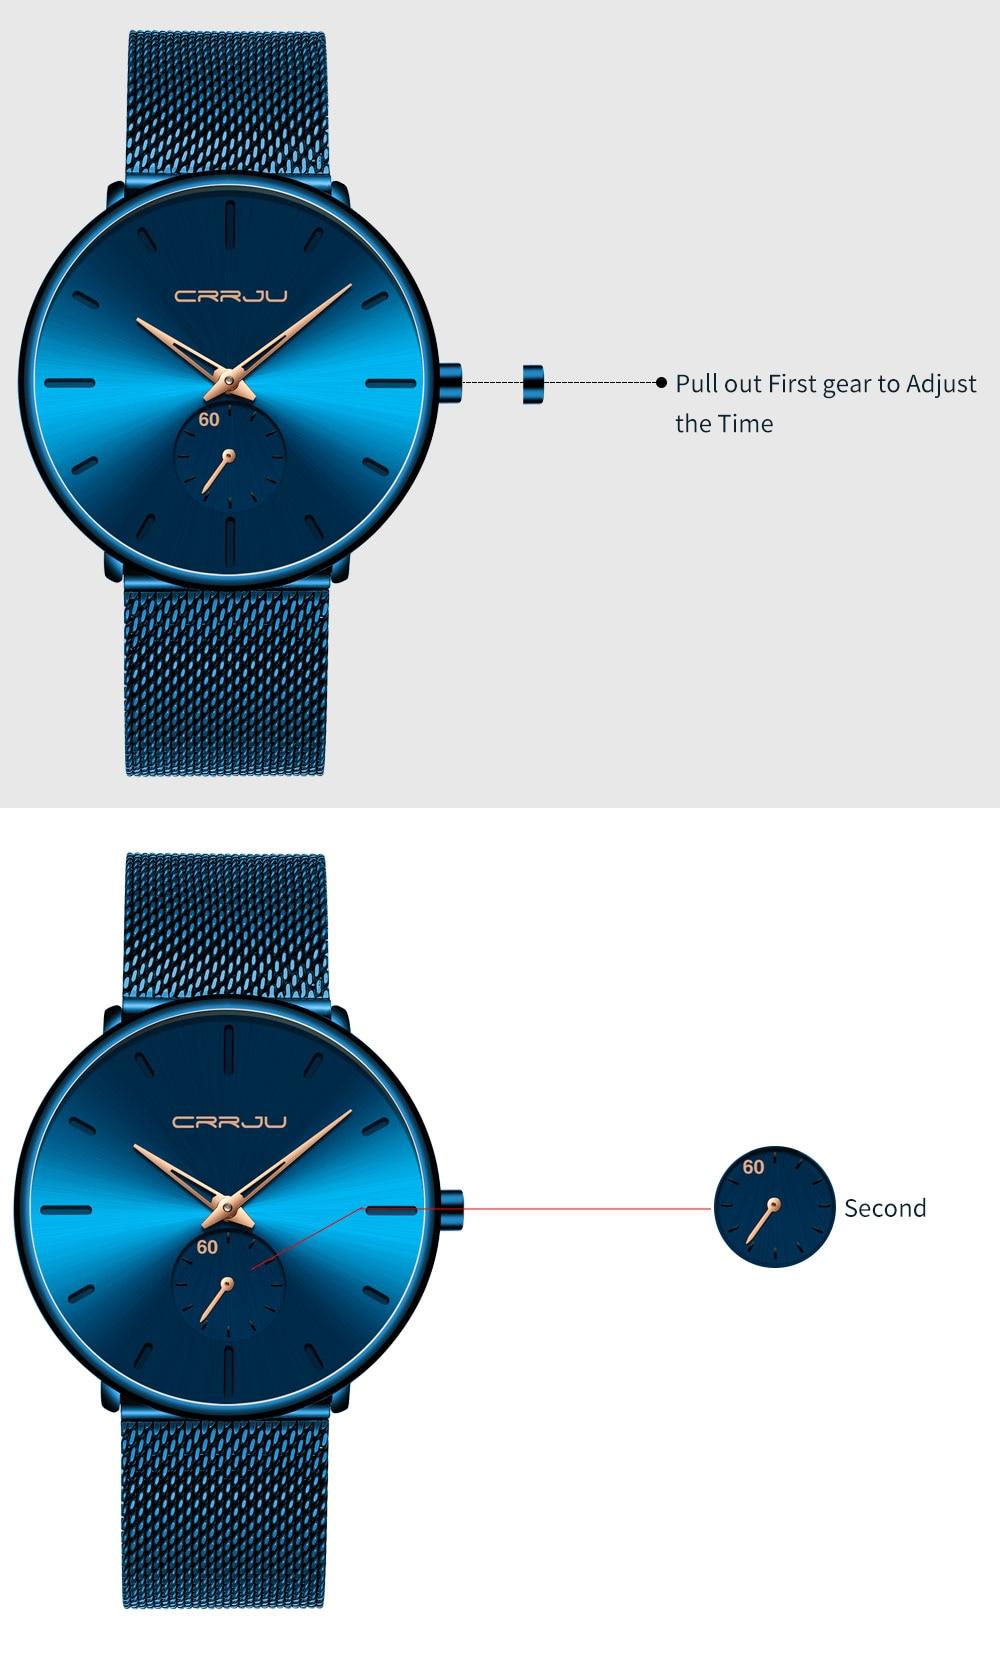 H78dc3c1c890e45878a42200c4932940aE CRRJU Ultra Thin Blue Stainless steel Quartz Watches Men Simple Fashion Business Japan Wristwatch Clock Male Relogio Masculino